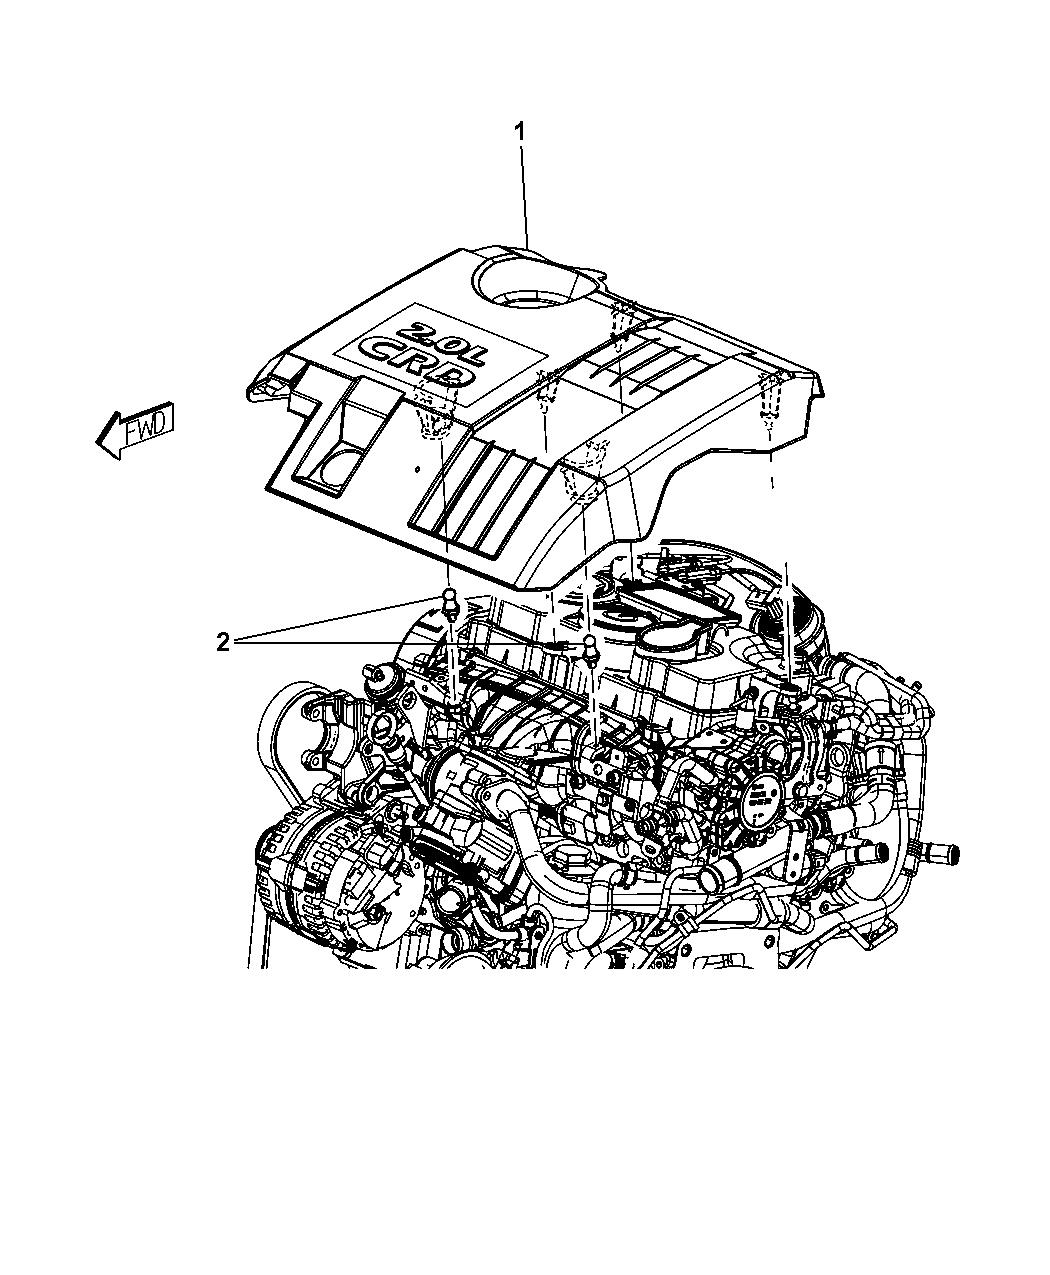 2009 Dodge Journey Engine Cover Related Parts Sxt Diagram Thumbnail 3